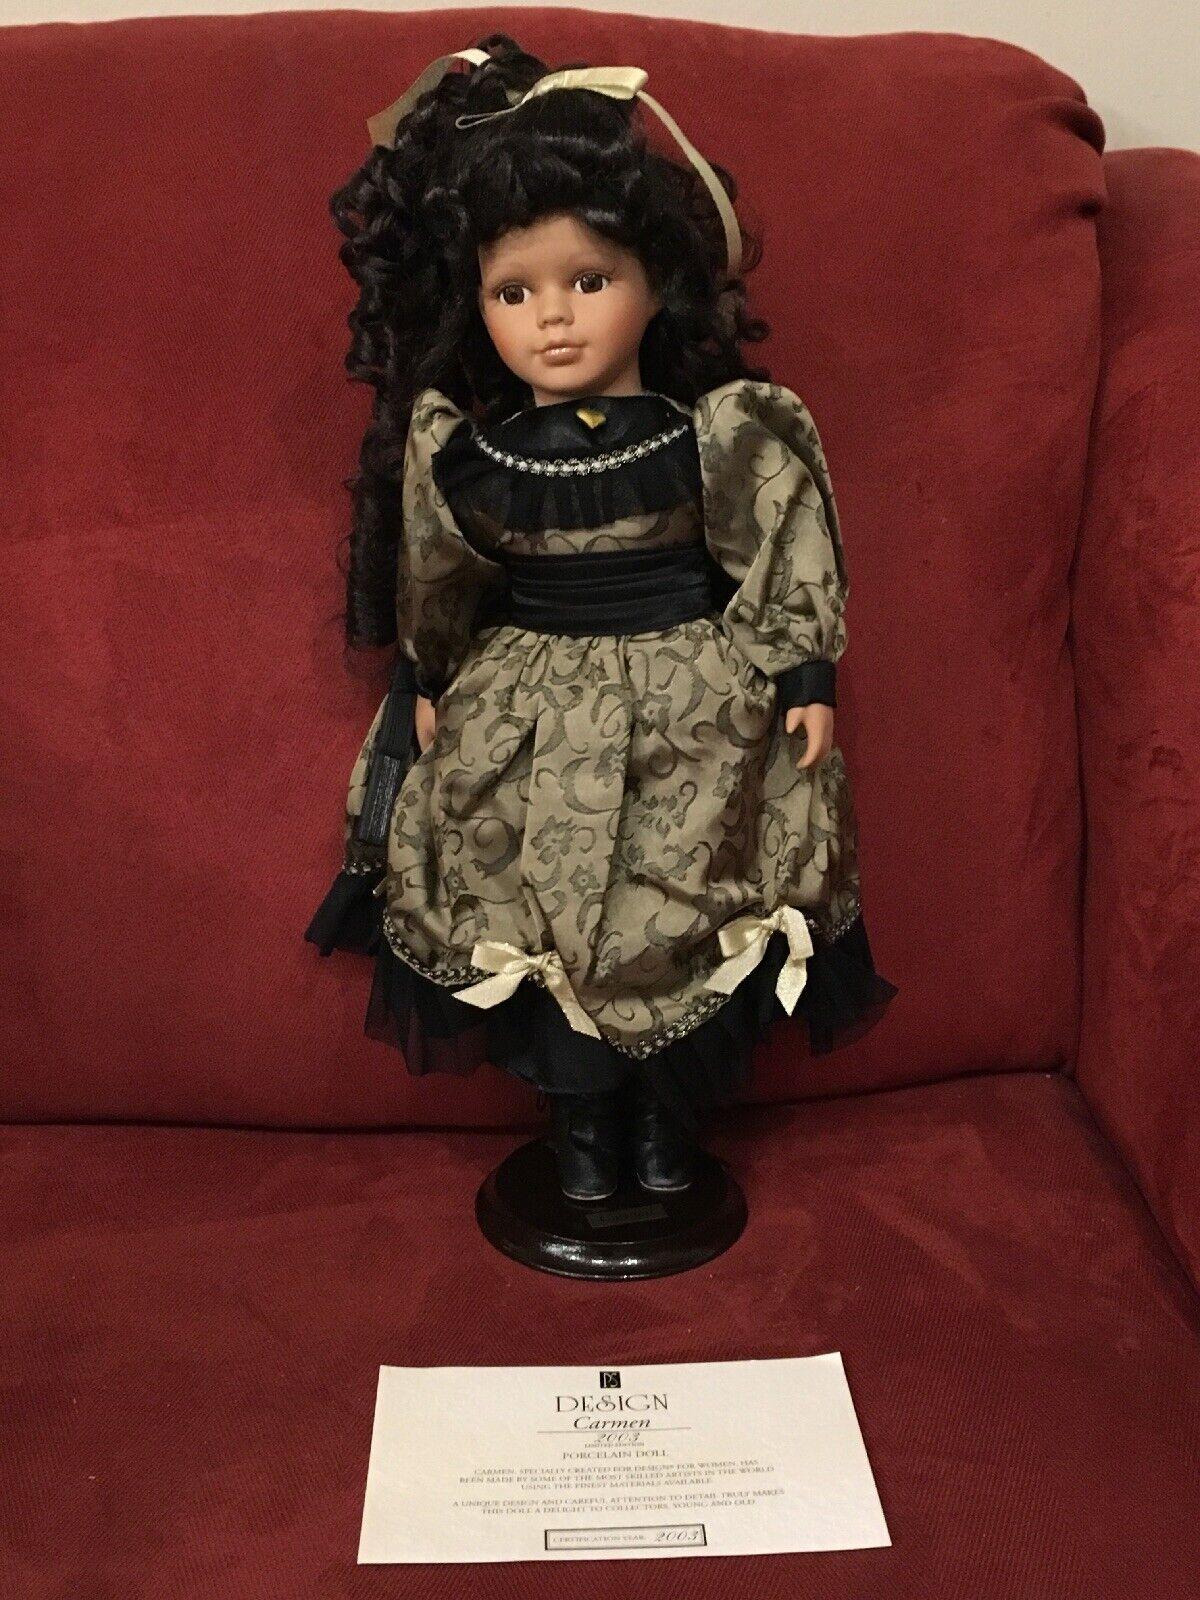 autoMEN  Porcelain bambola NIB 2003 Limited edizione 16  ttutti w ste Lord & Taylor  vendita calda